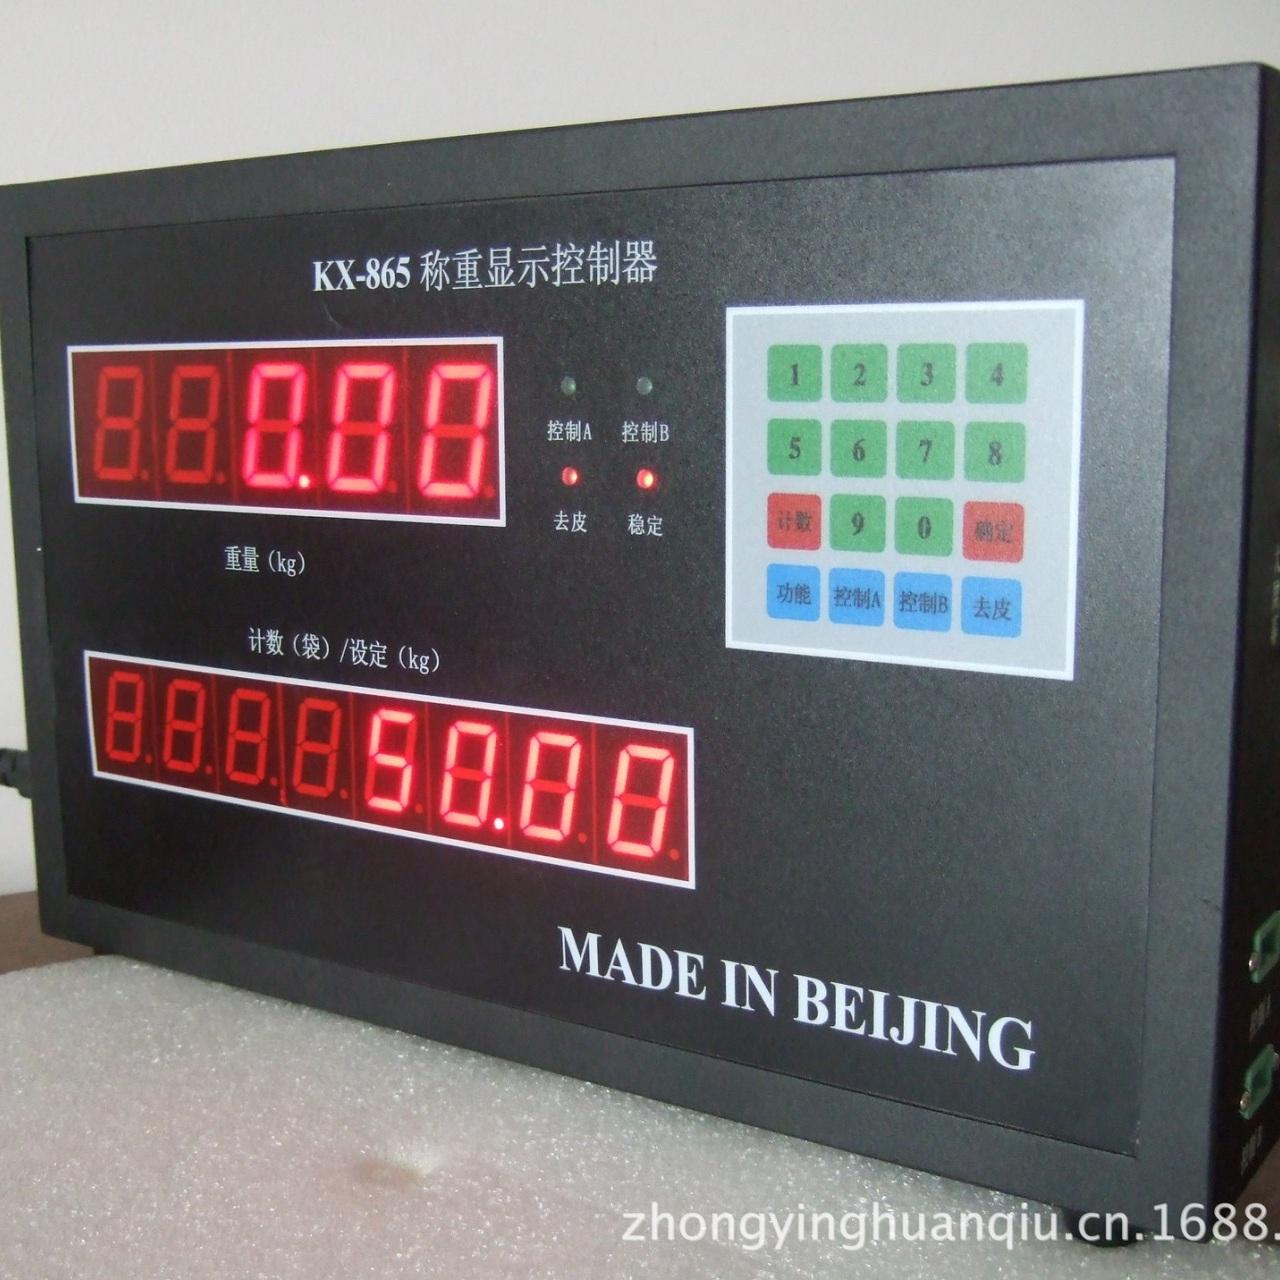 KX-865型包装控制器